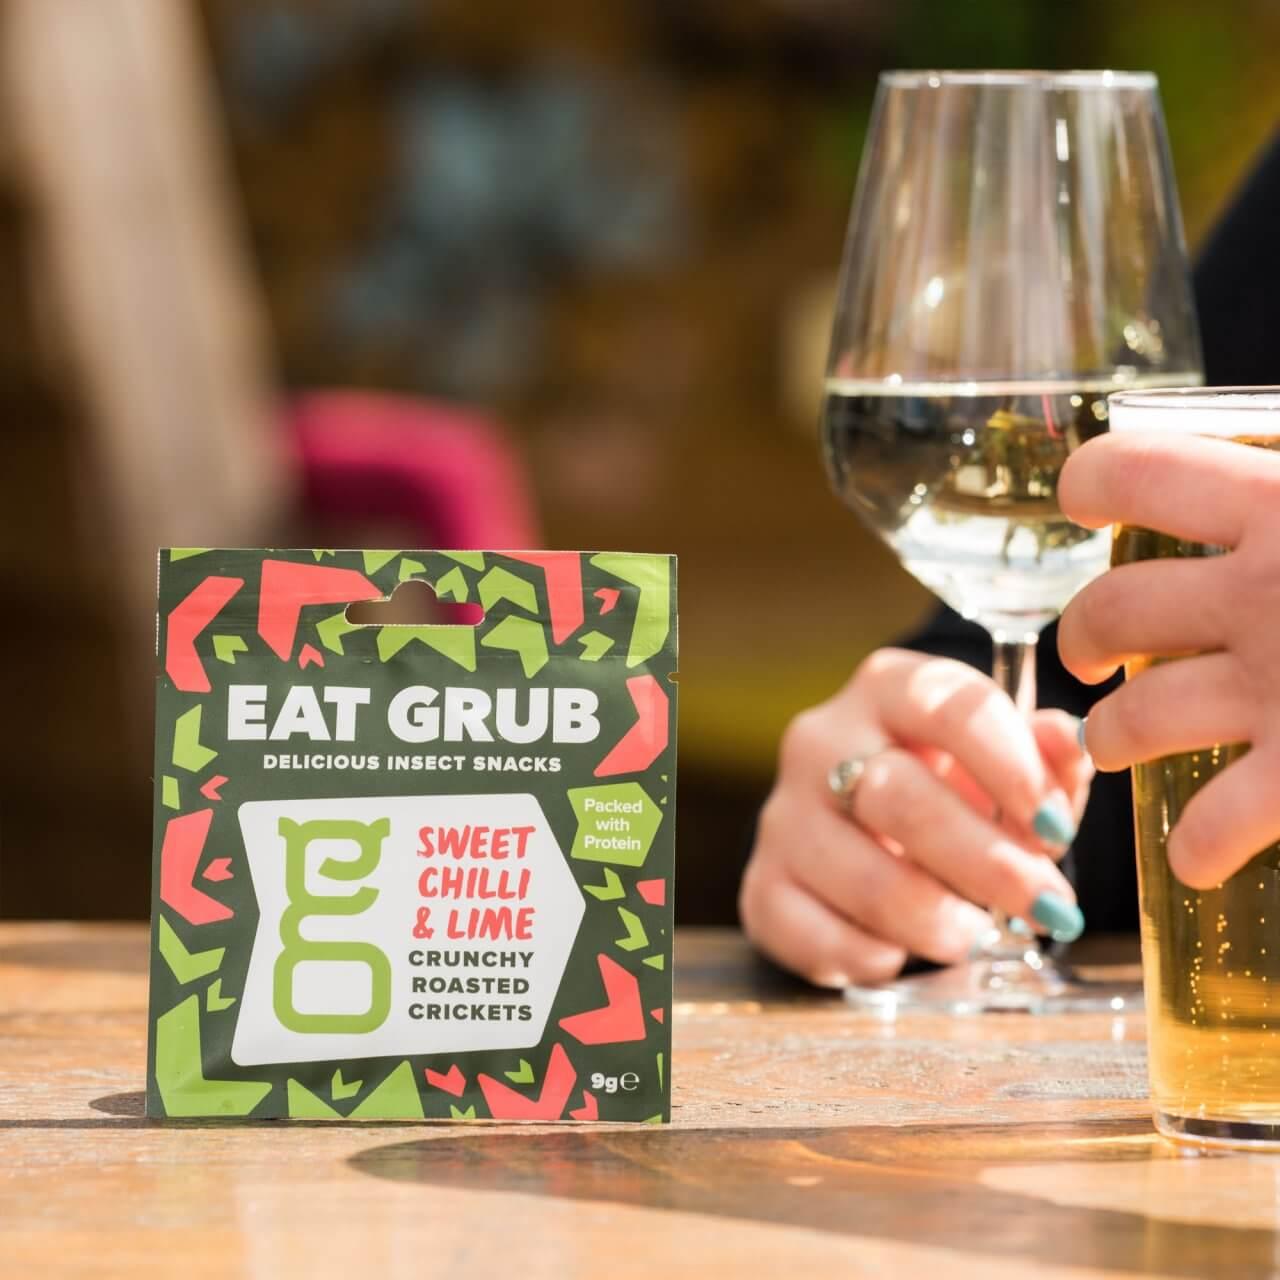 Eat Grub クランキー ロースト クリケット スイートチリ&ライム 15g